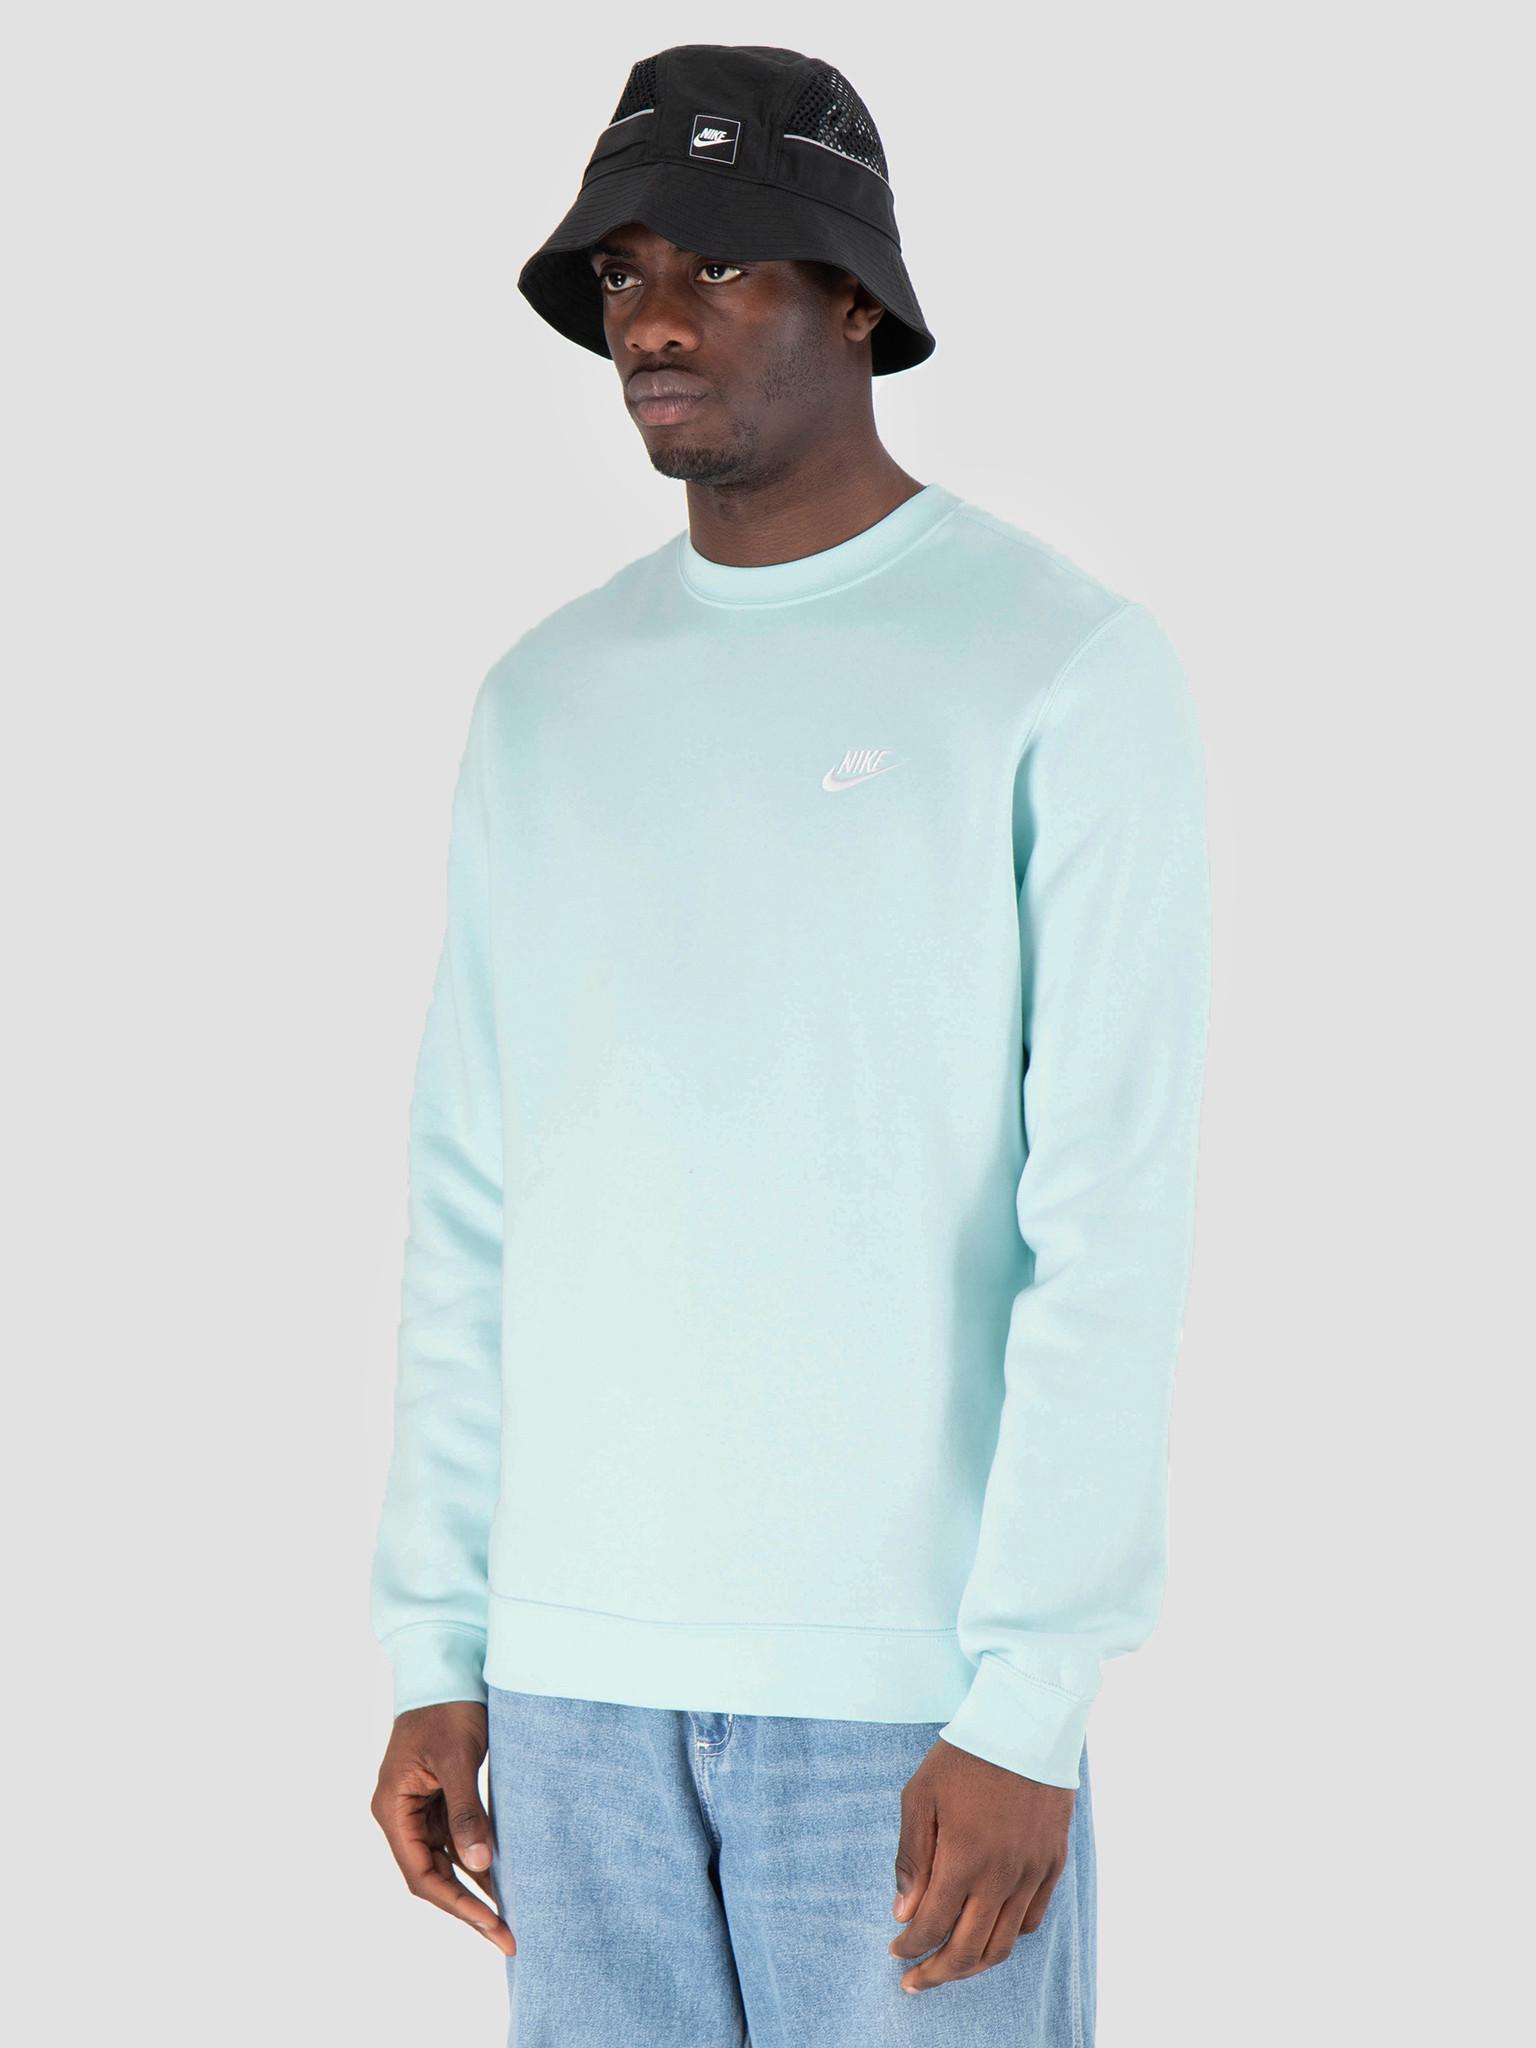 Nike Nike Sportswear Crew Teal Tint White 804340-336